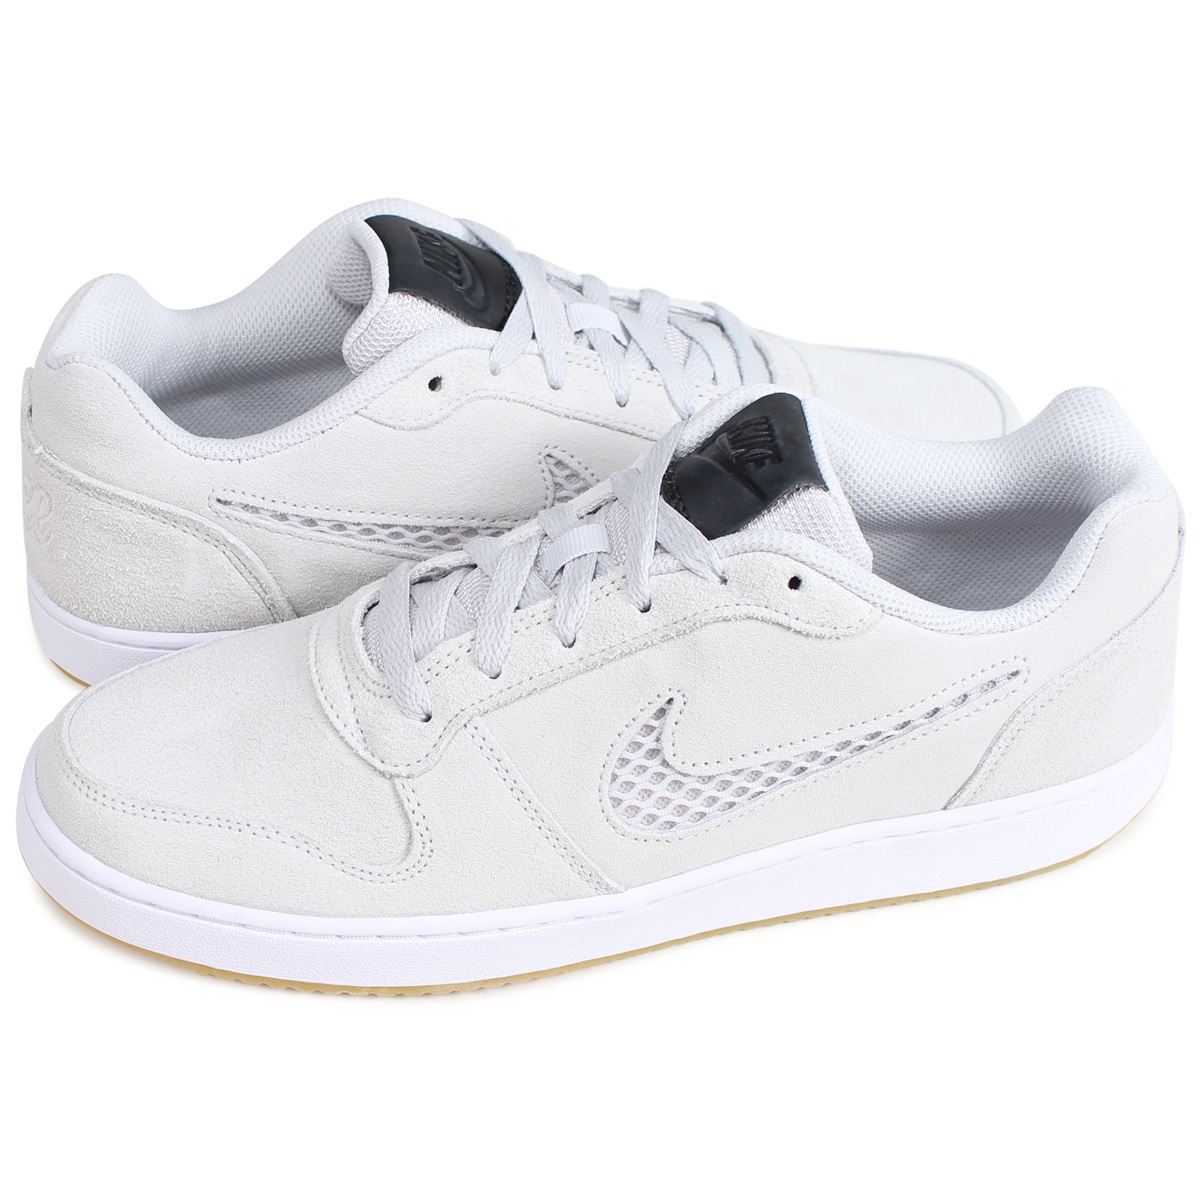 4fa64db1b503 ALLSPORTS  Nike NIKE Eve non sneakers men EBERNON LOW PREMIUM gray  AQ1774-002  2 15 Shinnyu load   192